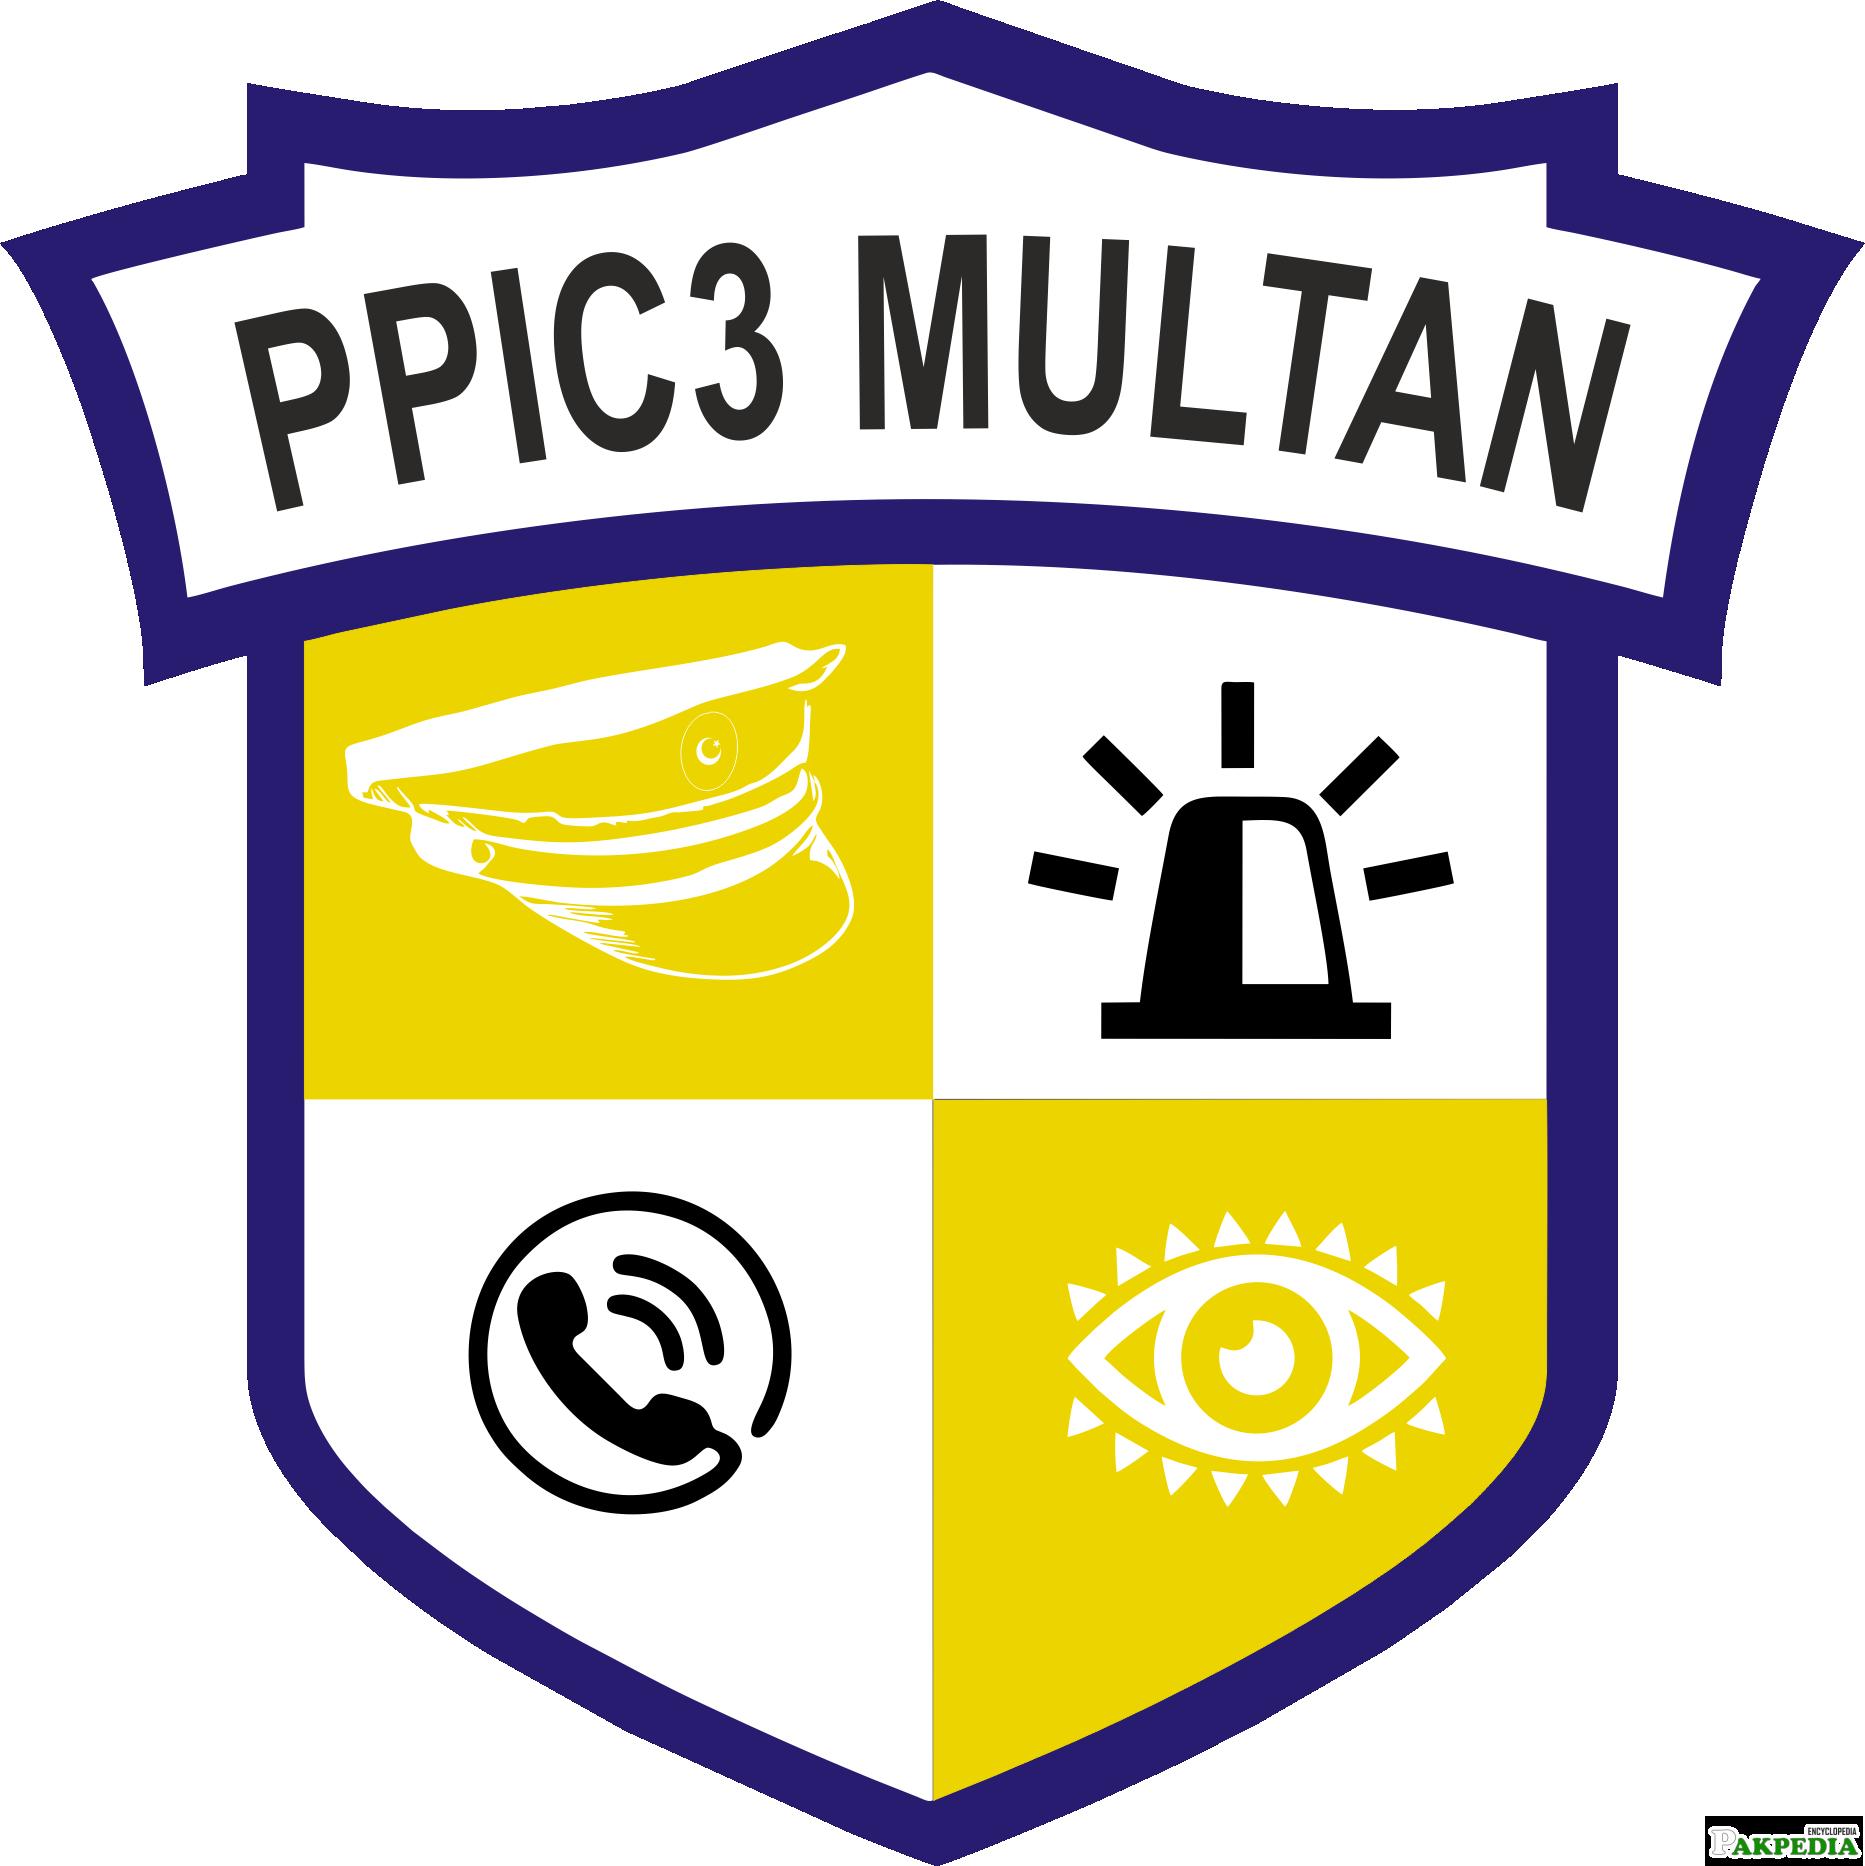 Logos of PSCA Multan